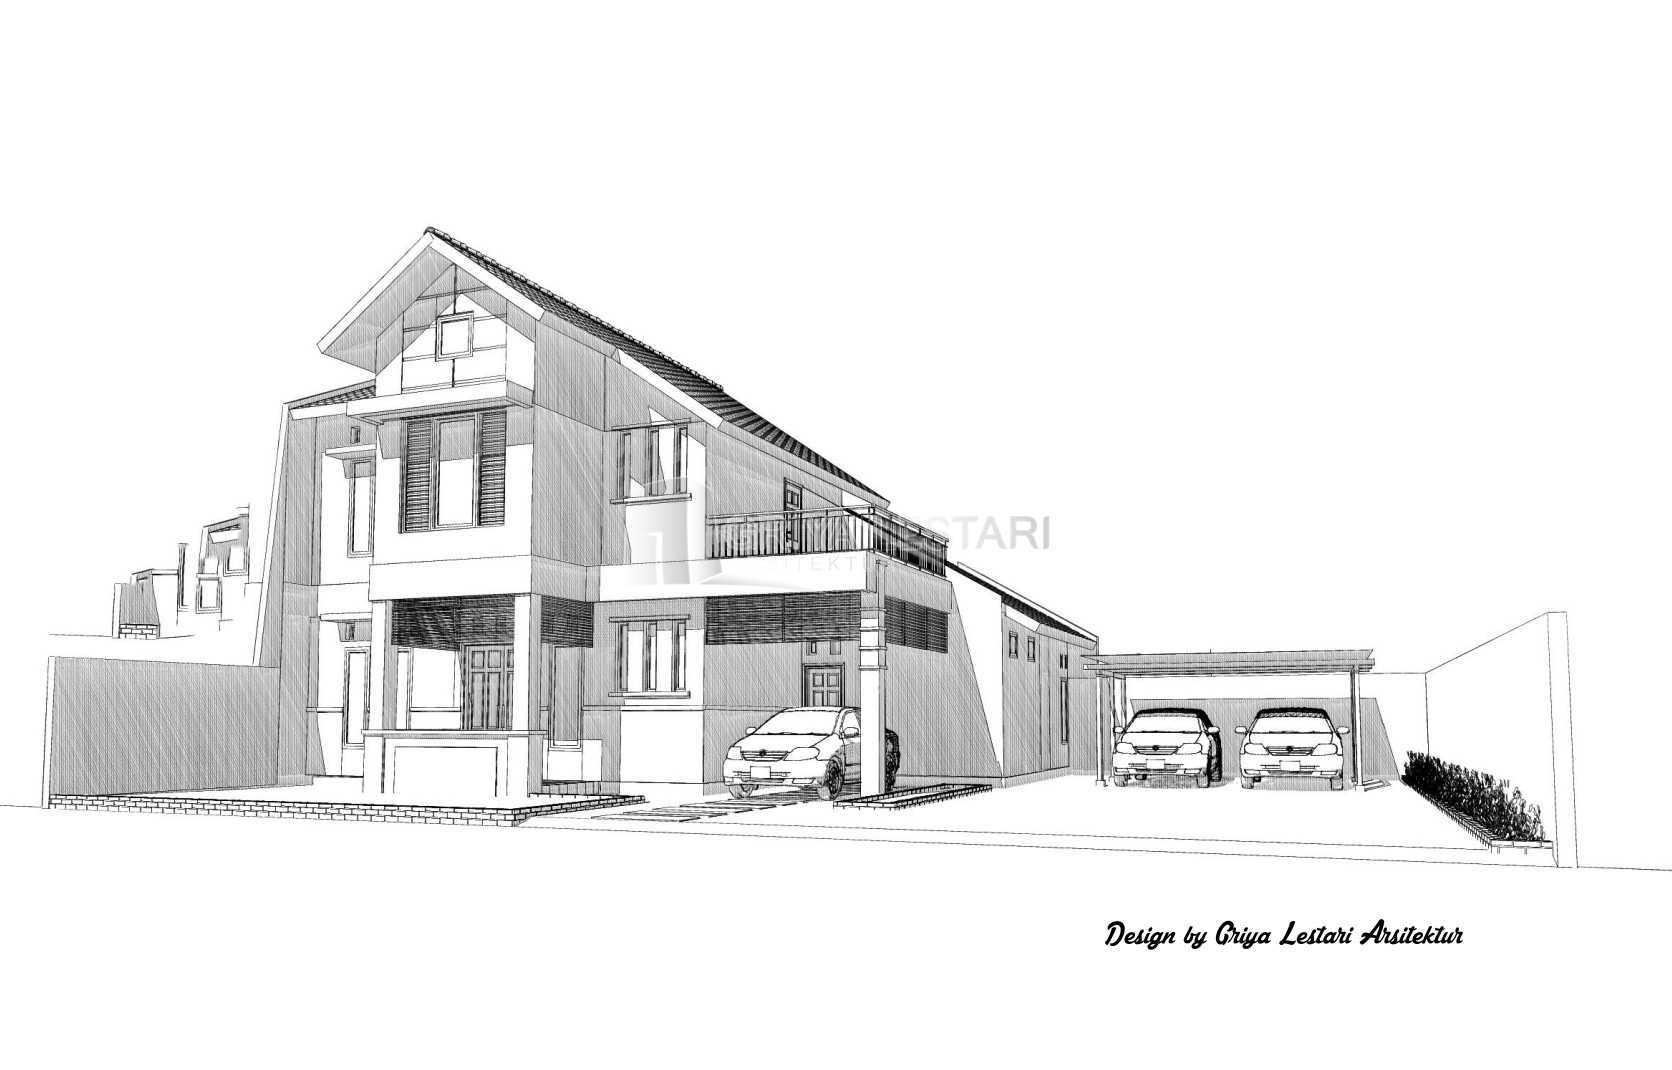 Jasa Arsitek Griya Lestari Arsitektur di Bantul